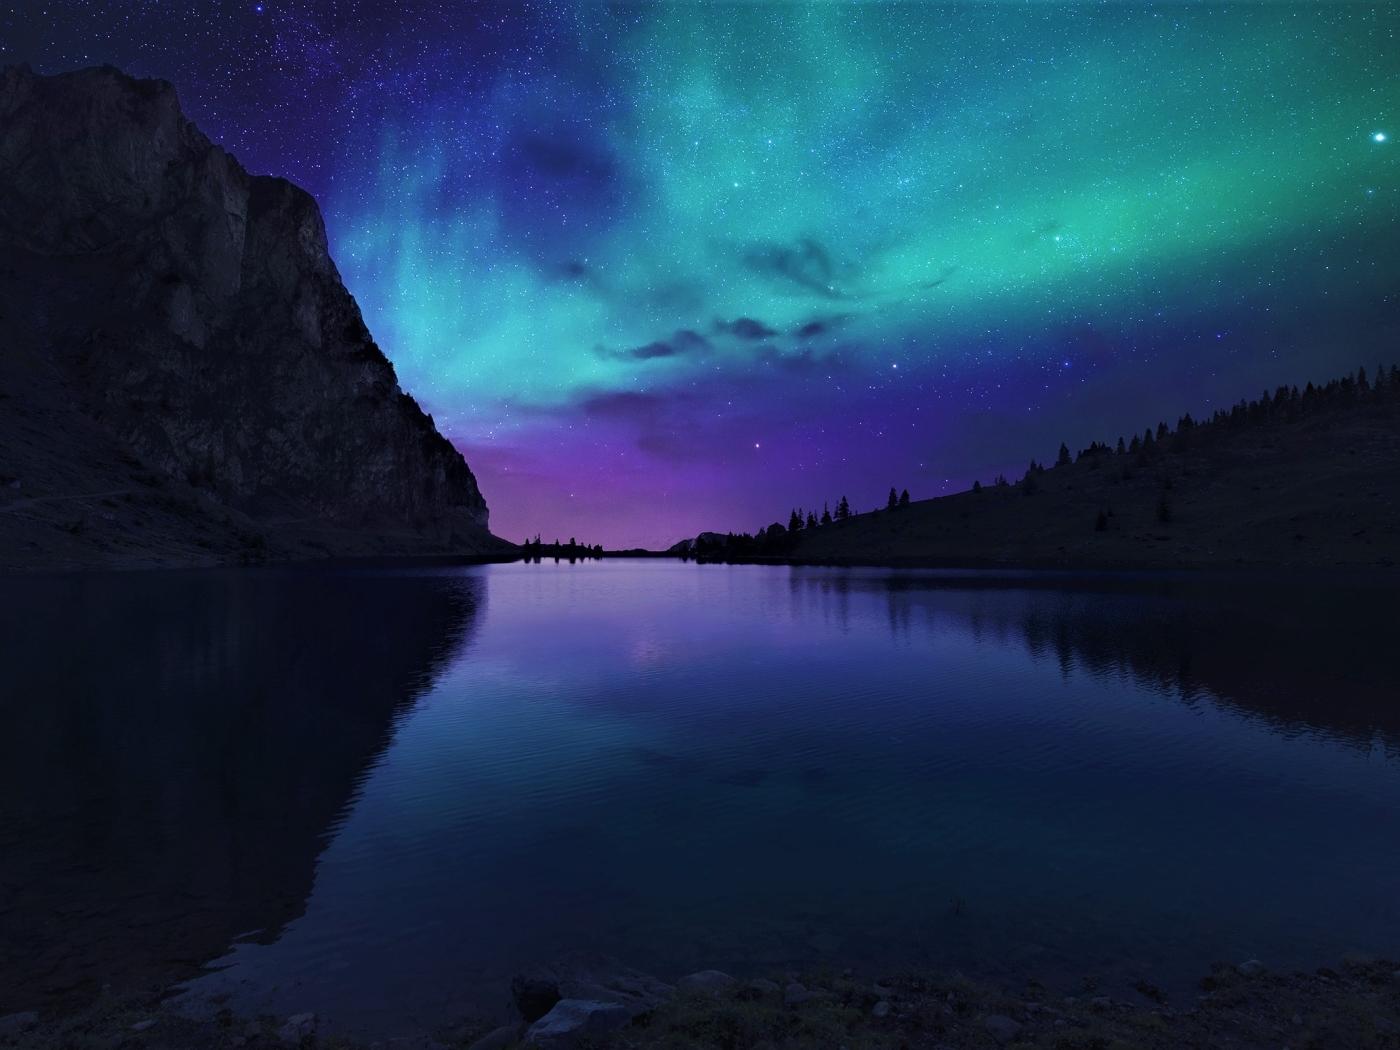 Aurora Borealis Northern Lights Over Mountain Lake  Full Hd 2k Wallpaper